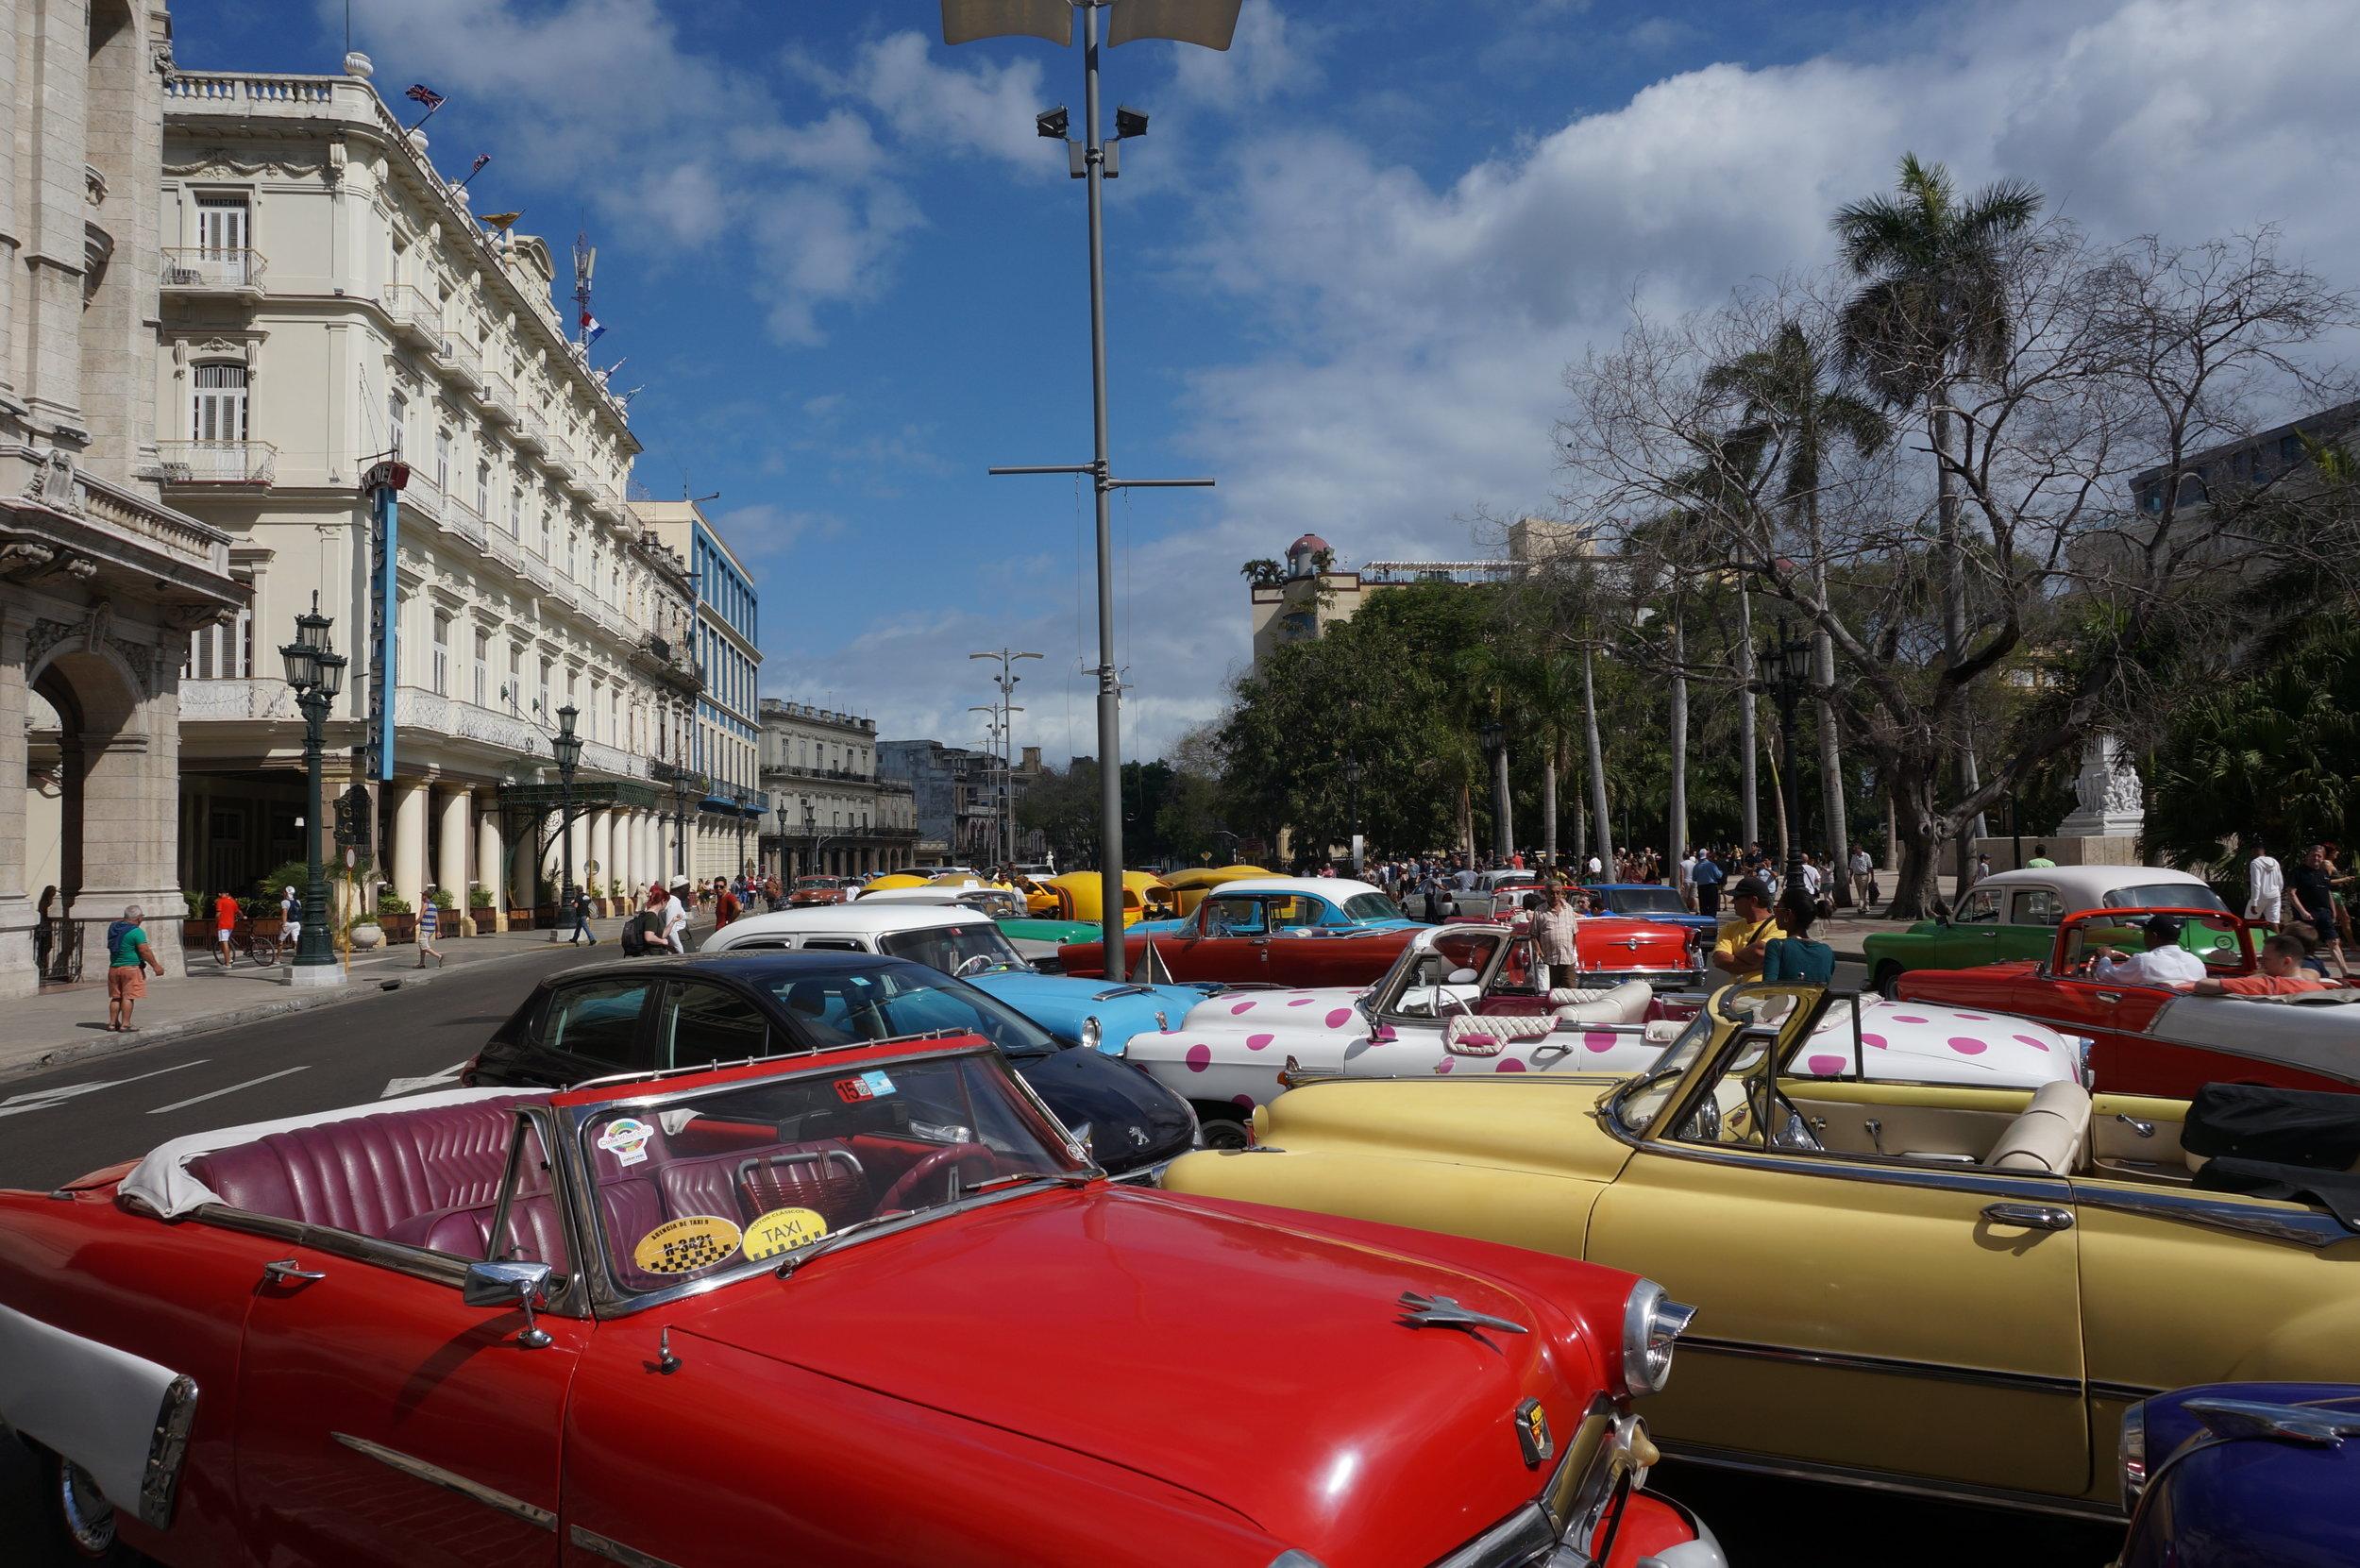 Vintage Cars in Cuba